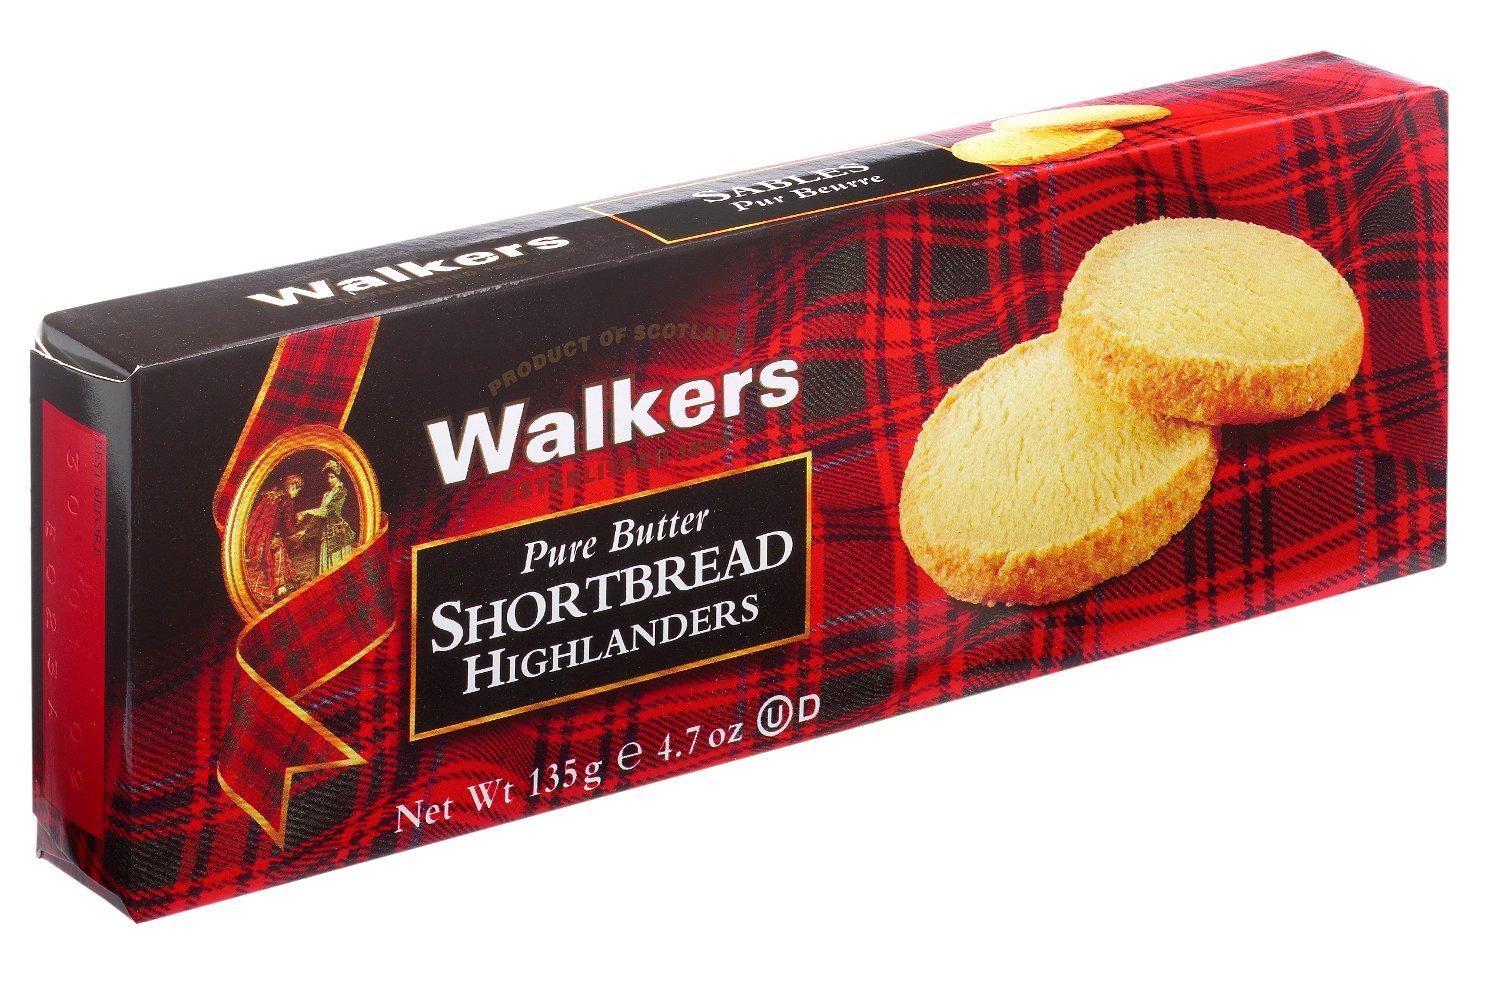 Walkers Shortbread Highlanders, 4.7 Ounce Box